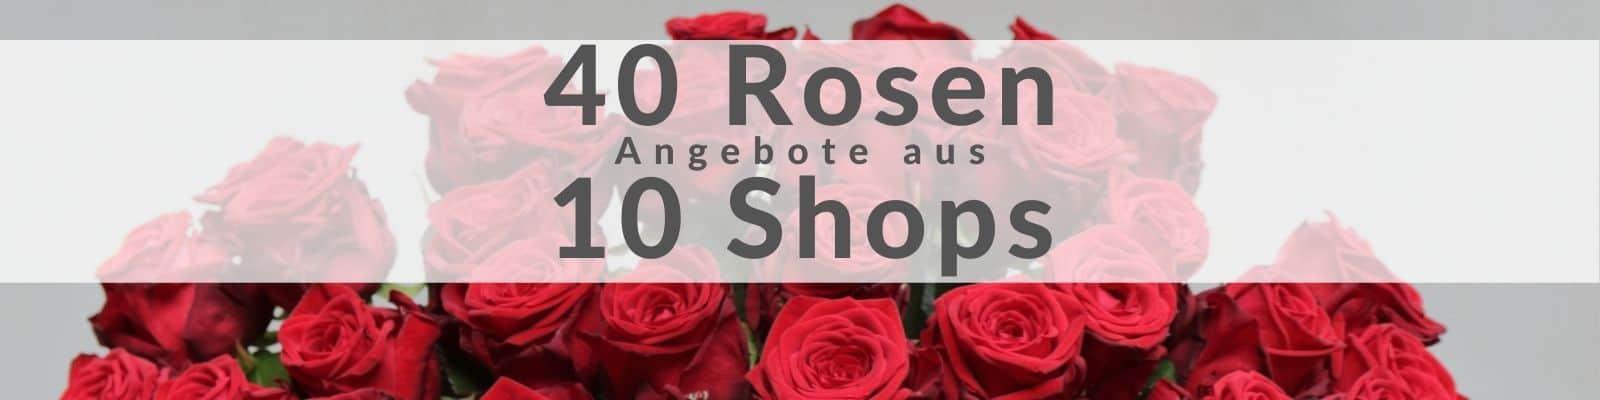 40 Rosen verschicken